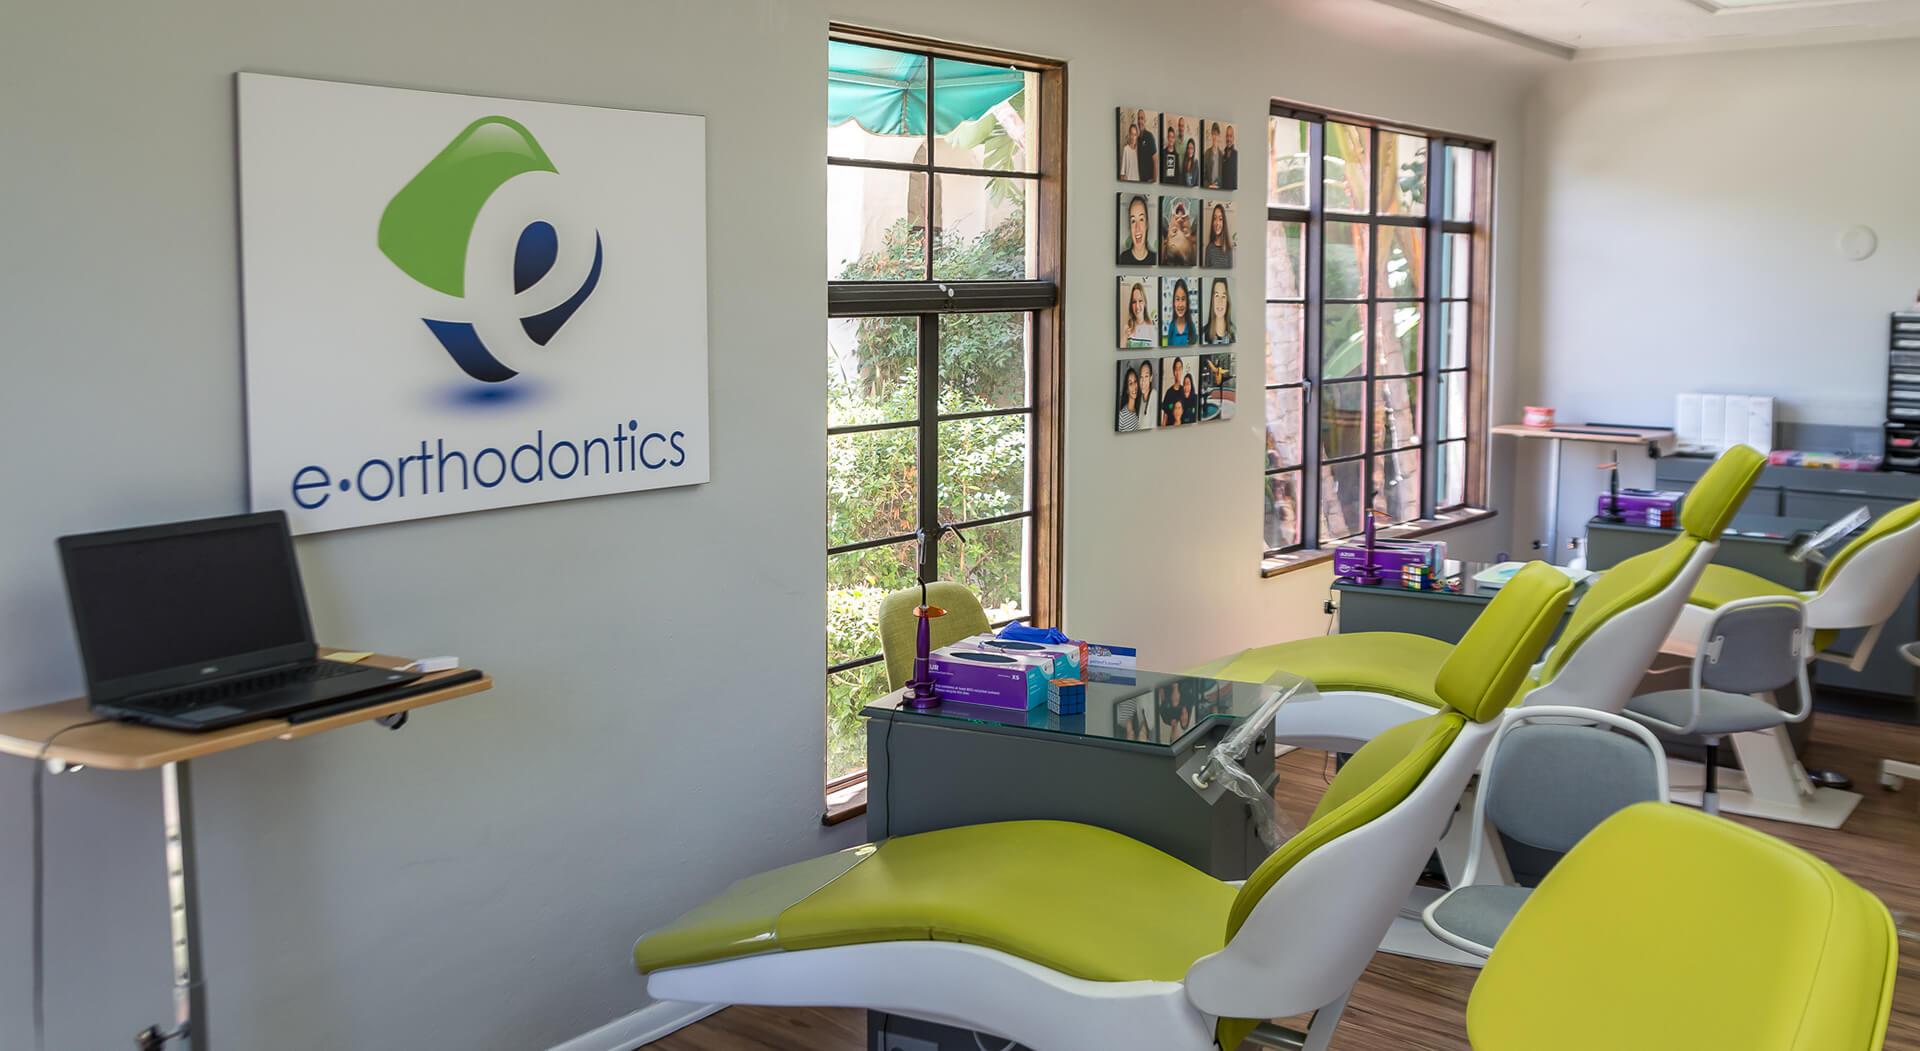 About E-Orthodontics